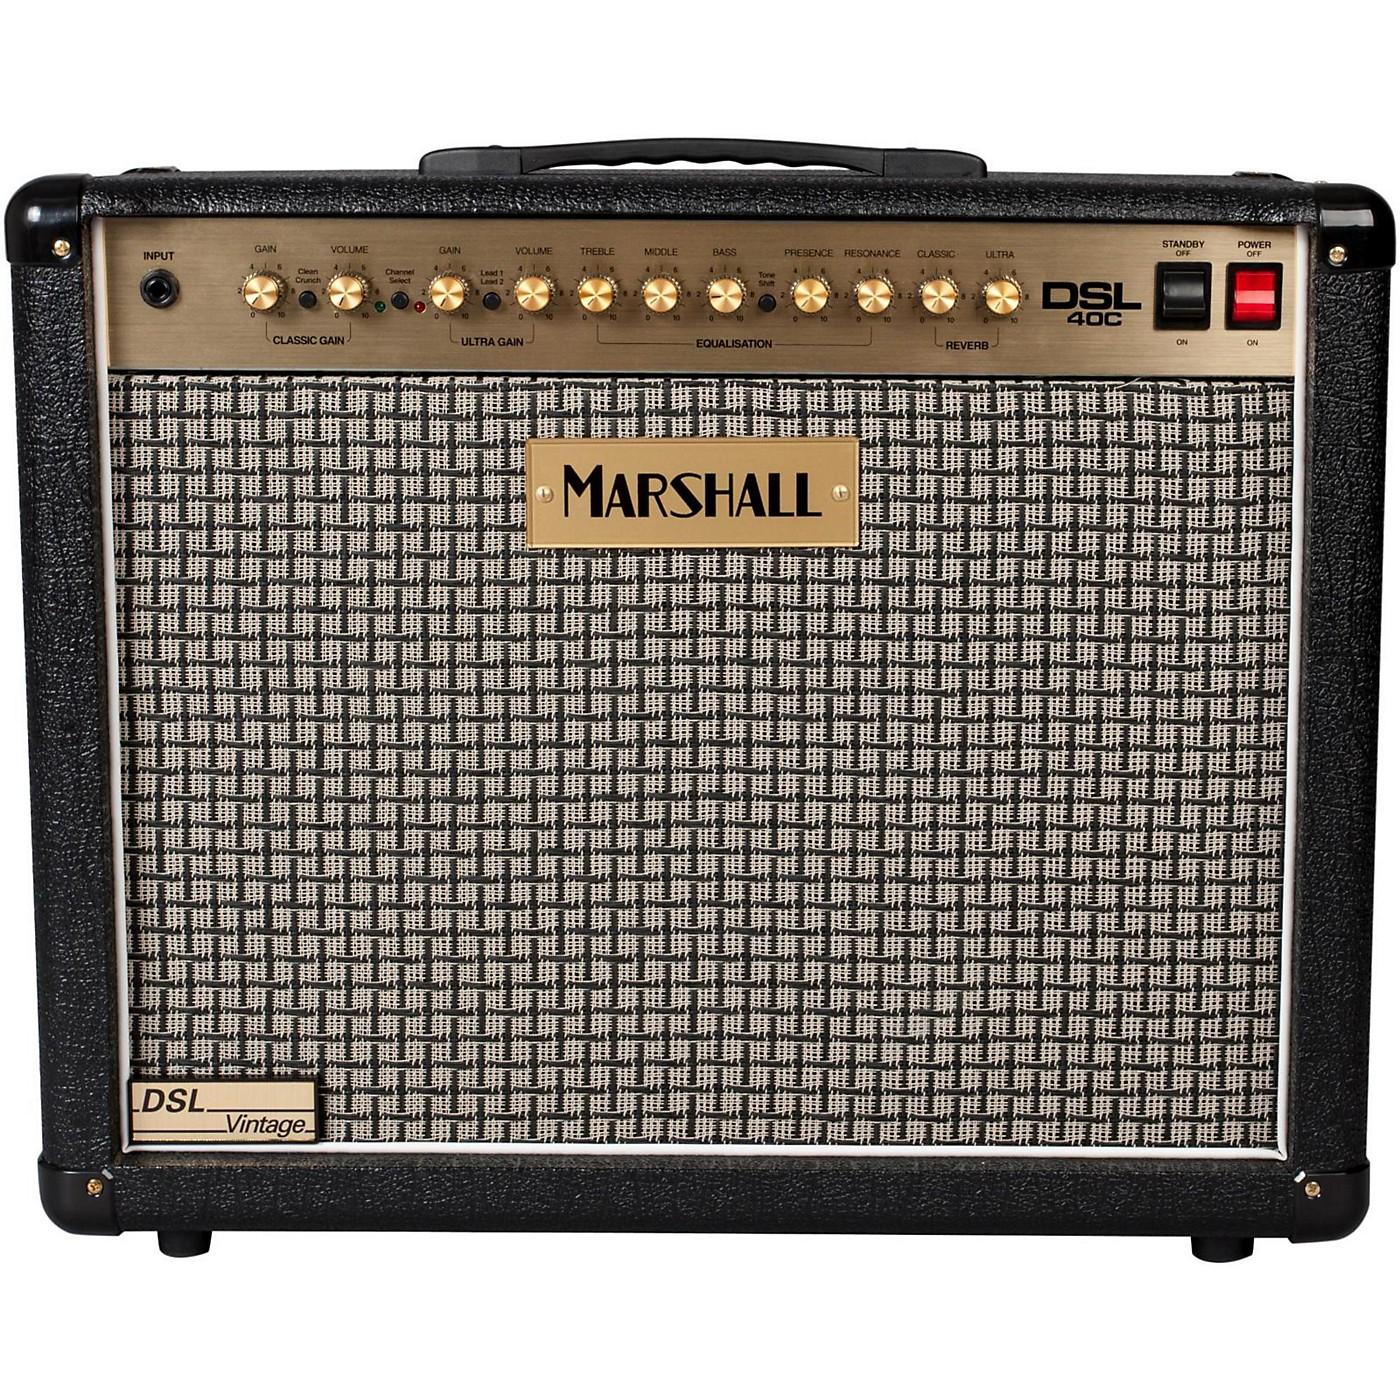 Marshall DSL40C Limited Edition Vintage 40W 1x12 Tube